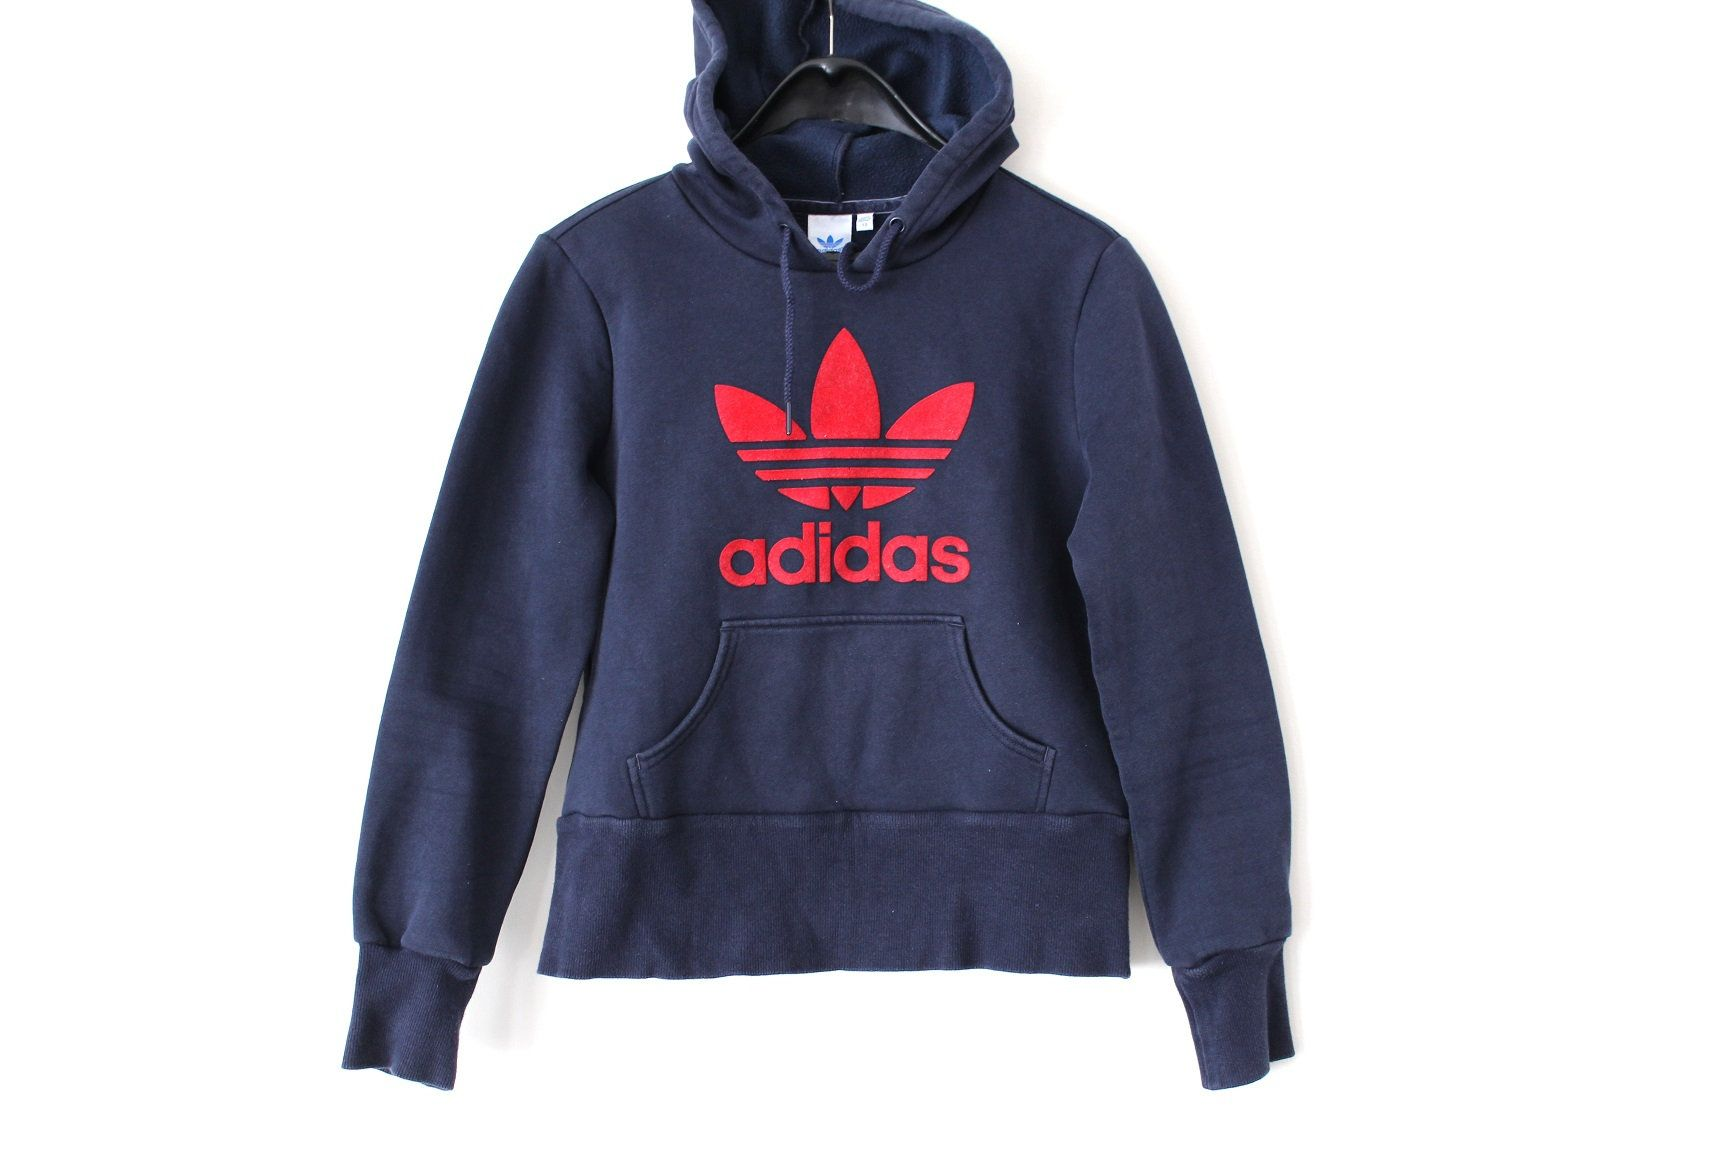 Pin On Sweatshirts Hoodies